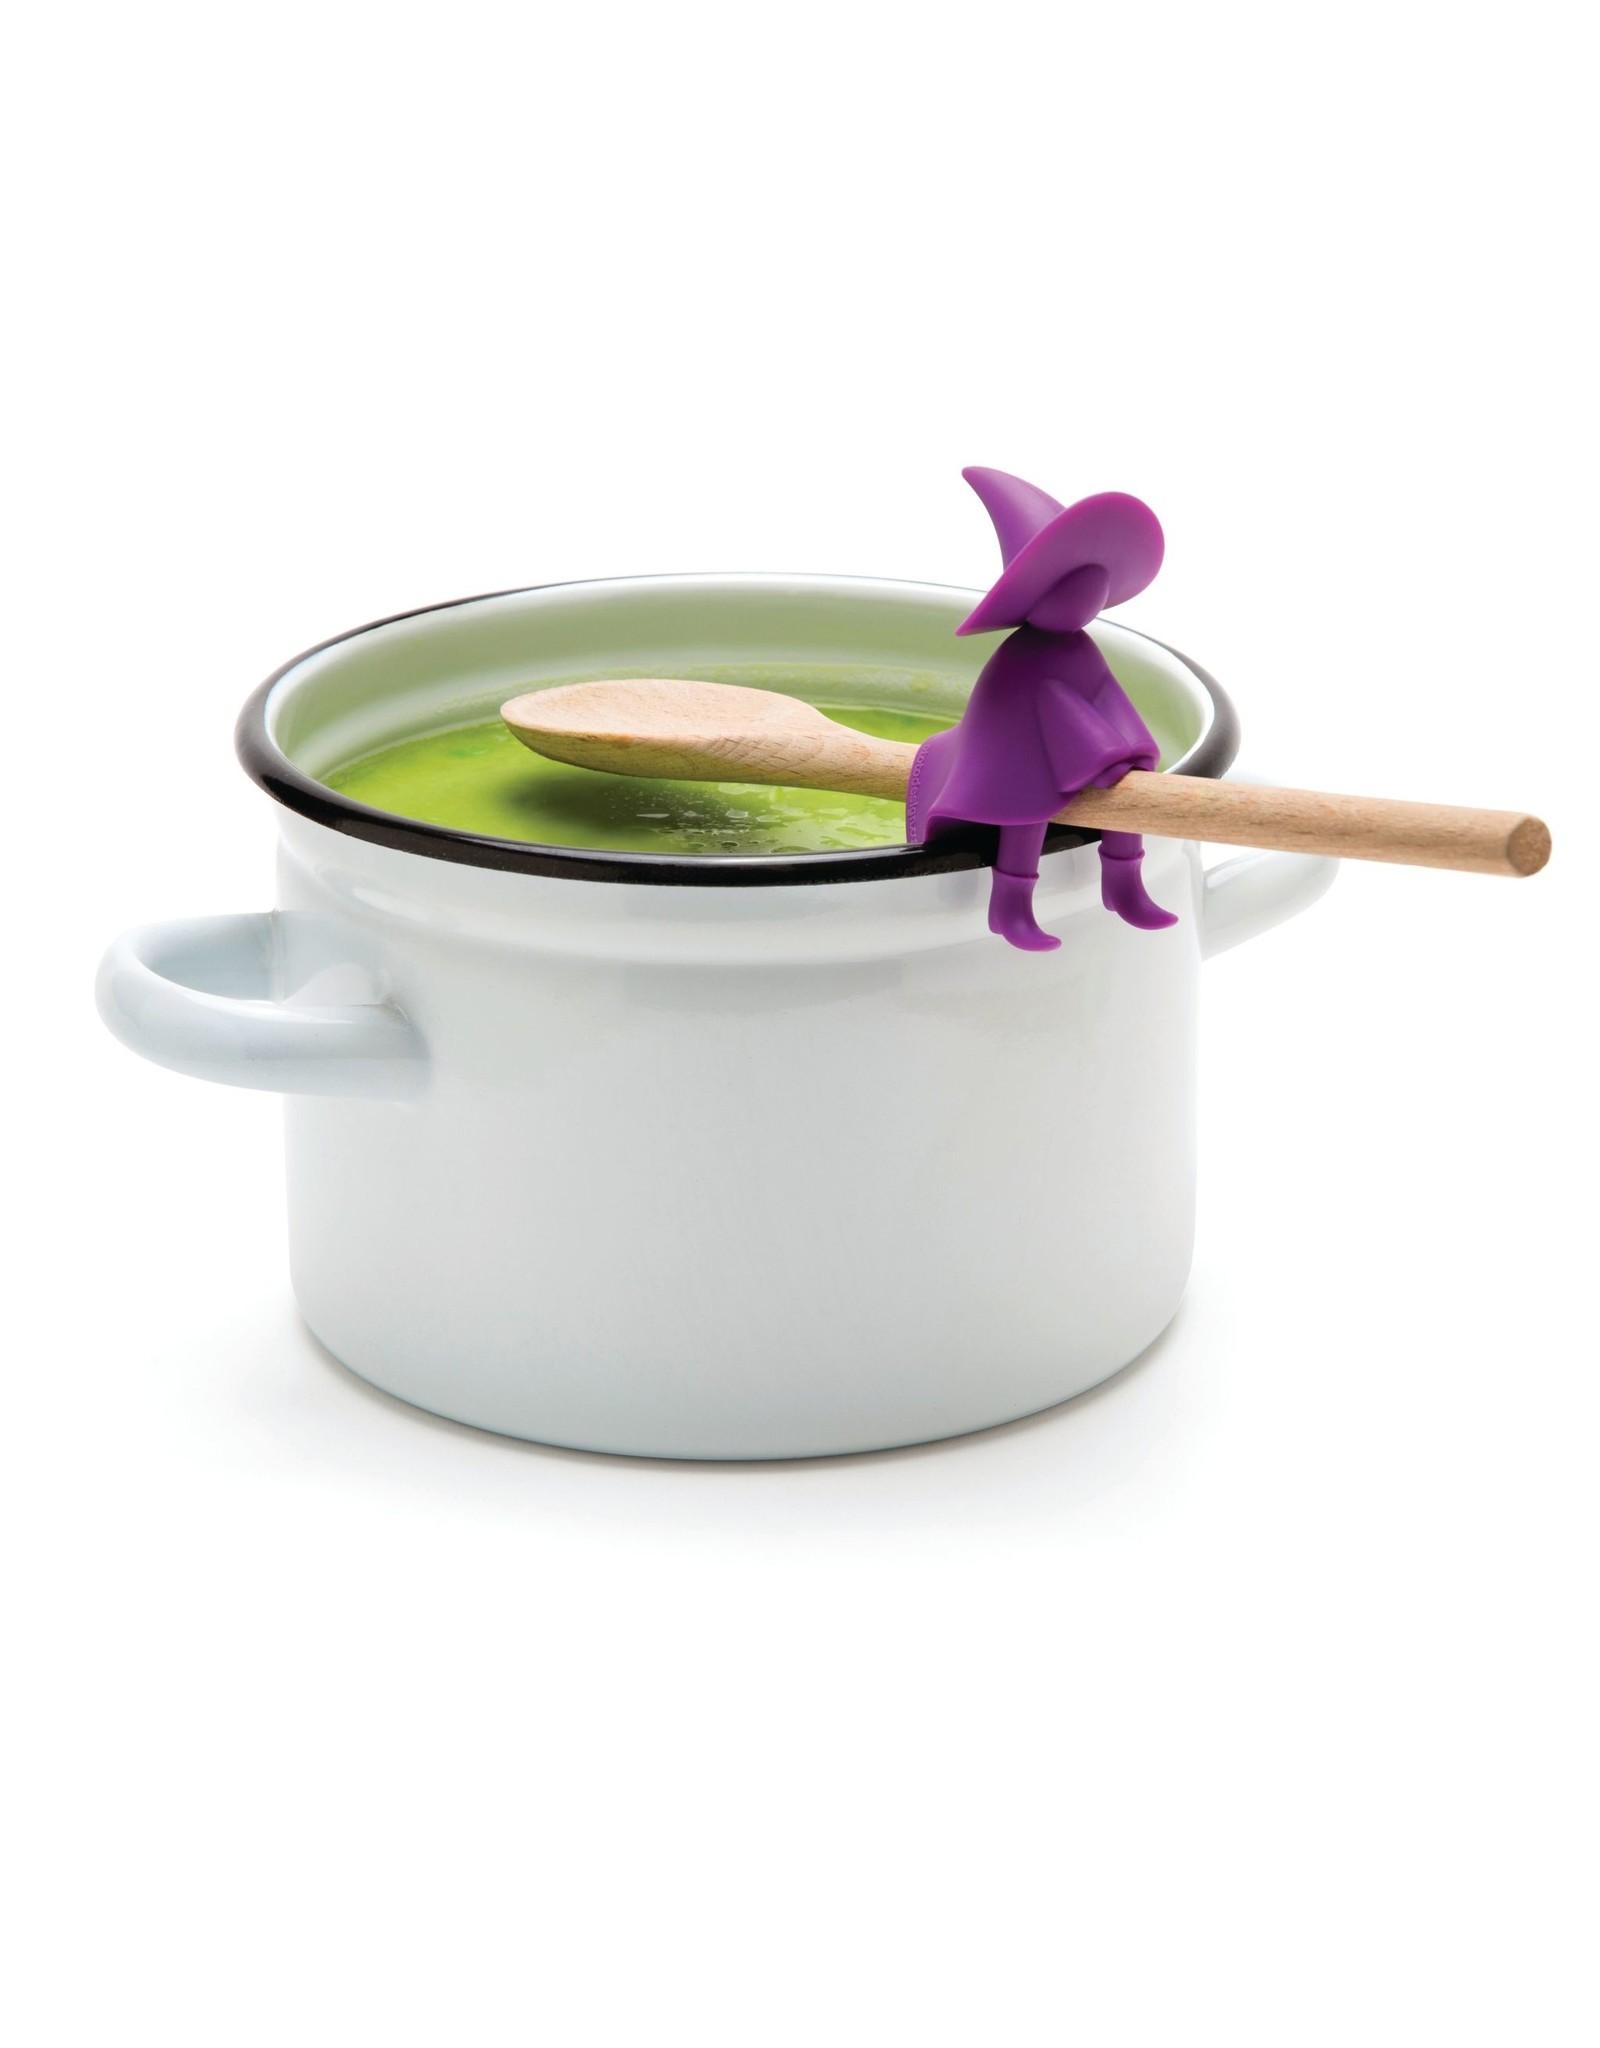 Ototo purple spoon holder - Agatha the wich